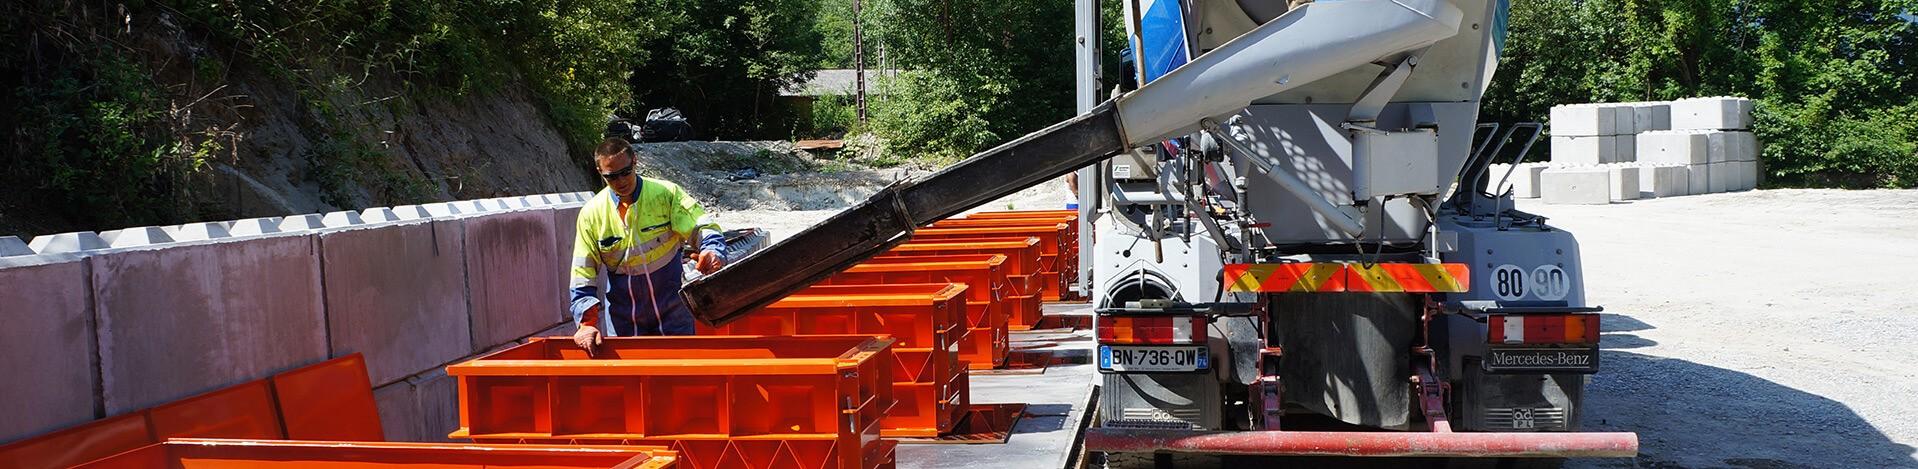 Partenariat avec fabricant de bloc béton